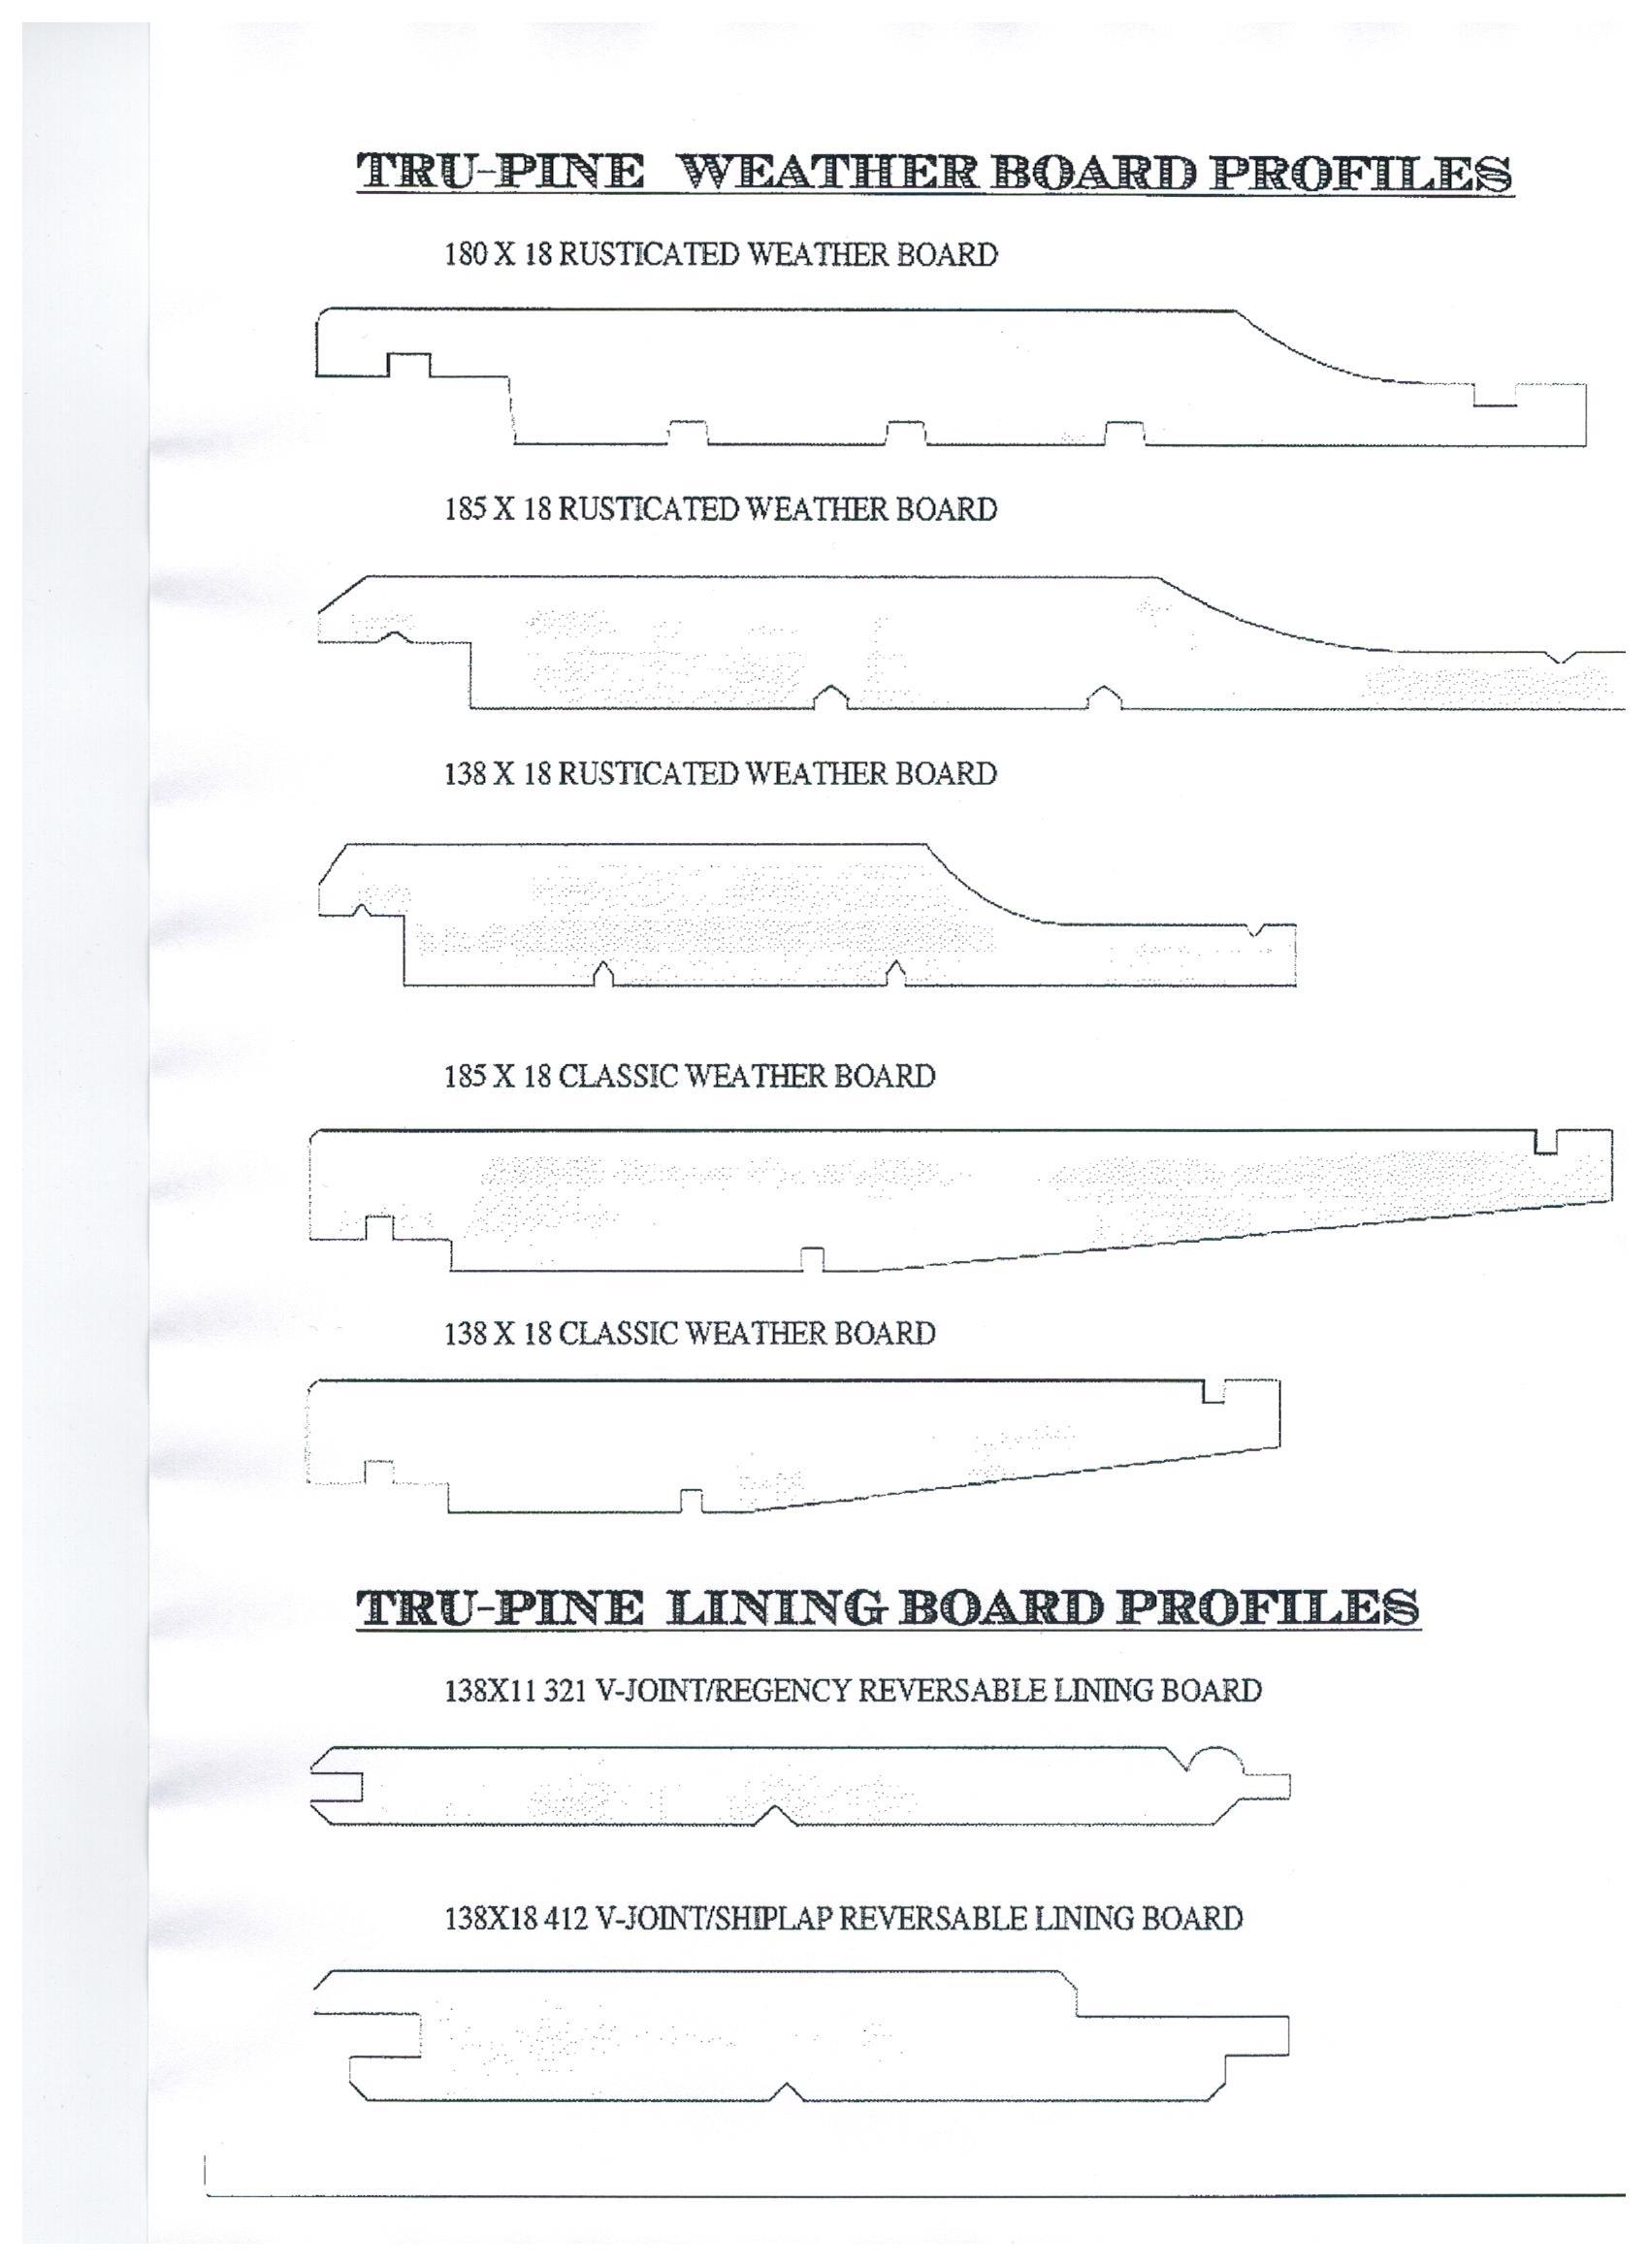 Tru Pine Profiles